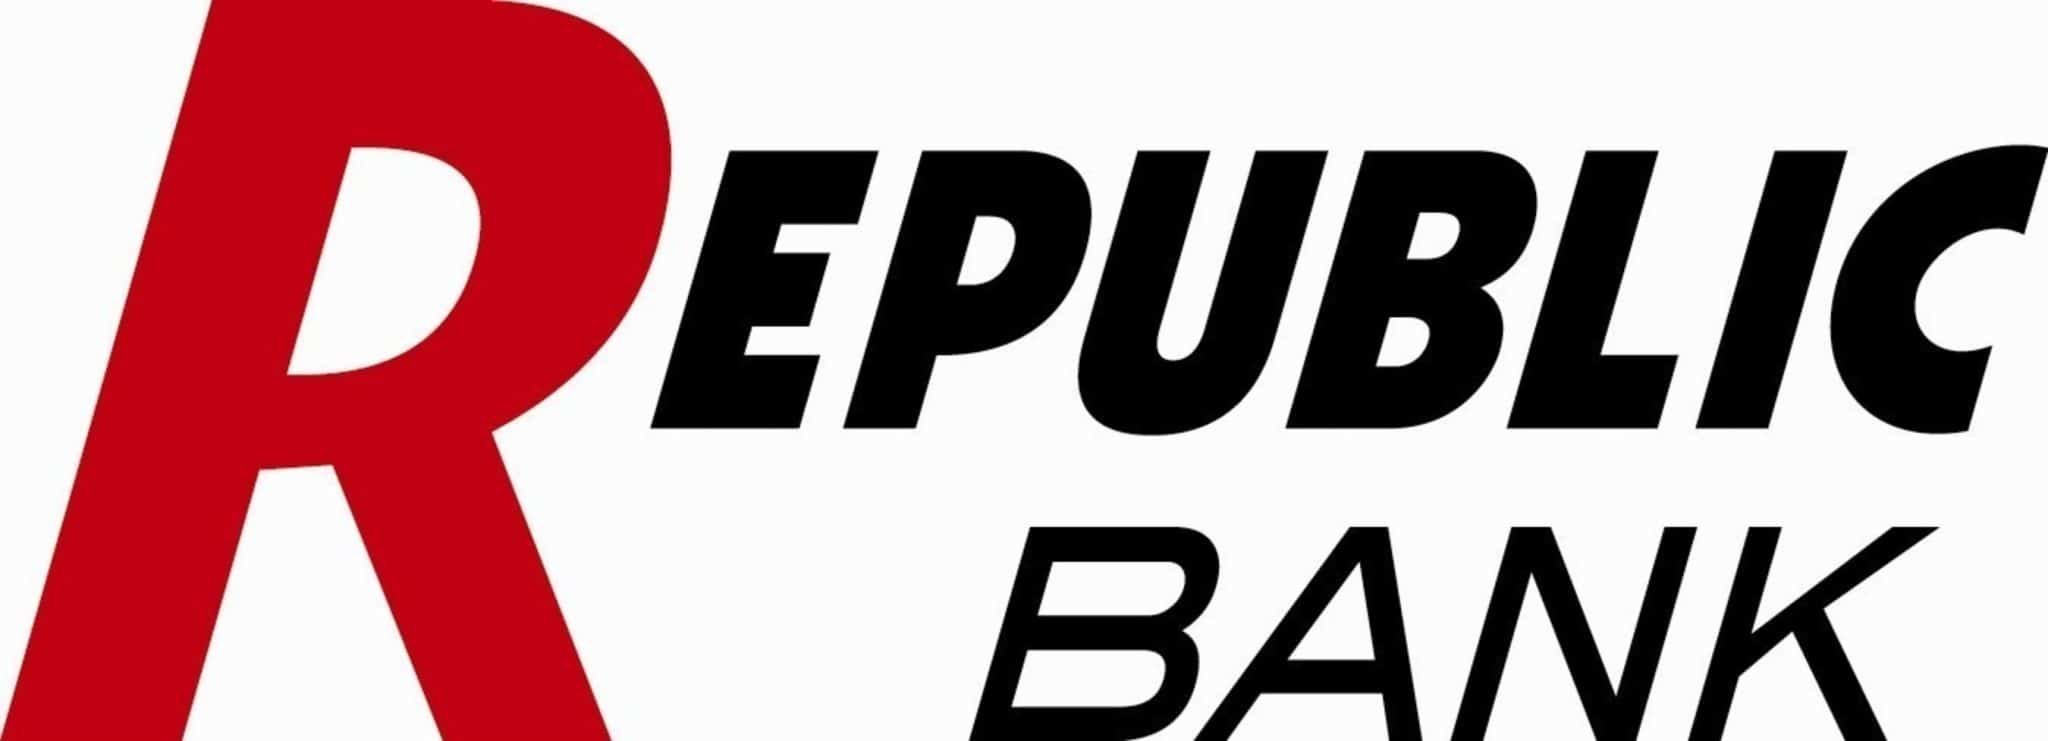 Republic Bank logo. (PRNewsFoto/Republic First Bancorp, Inc.)